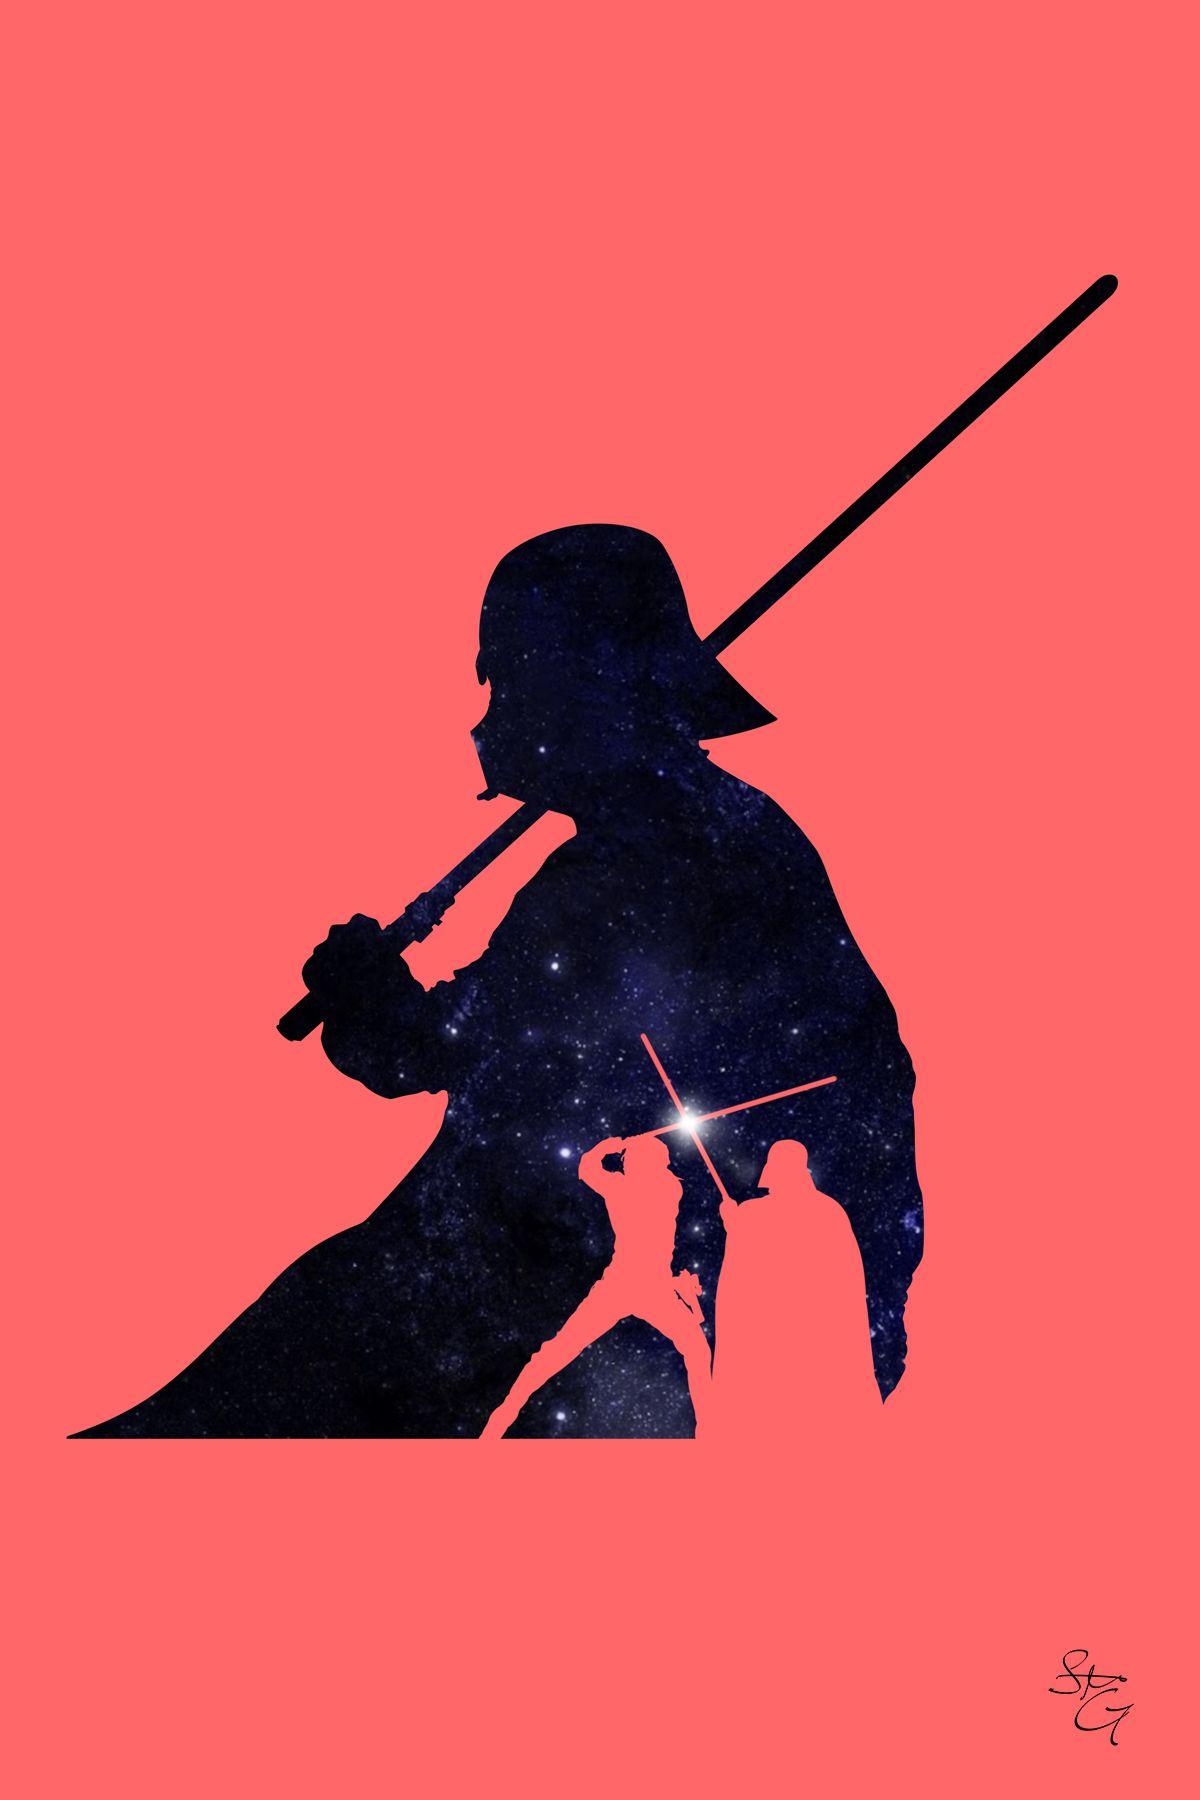 Steve Garcia star wars - Google Search | Star Wars | Pinterest ...